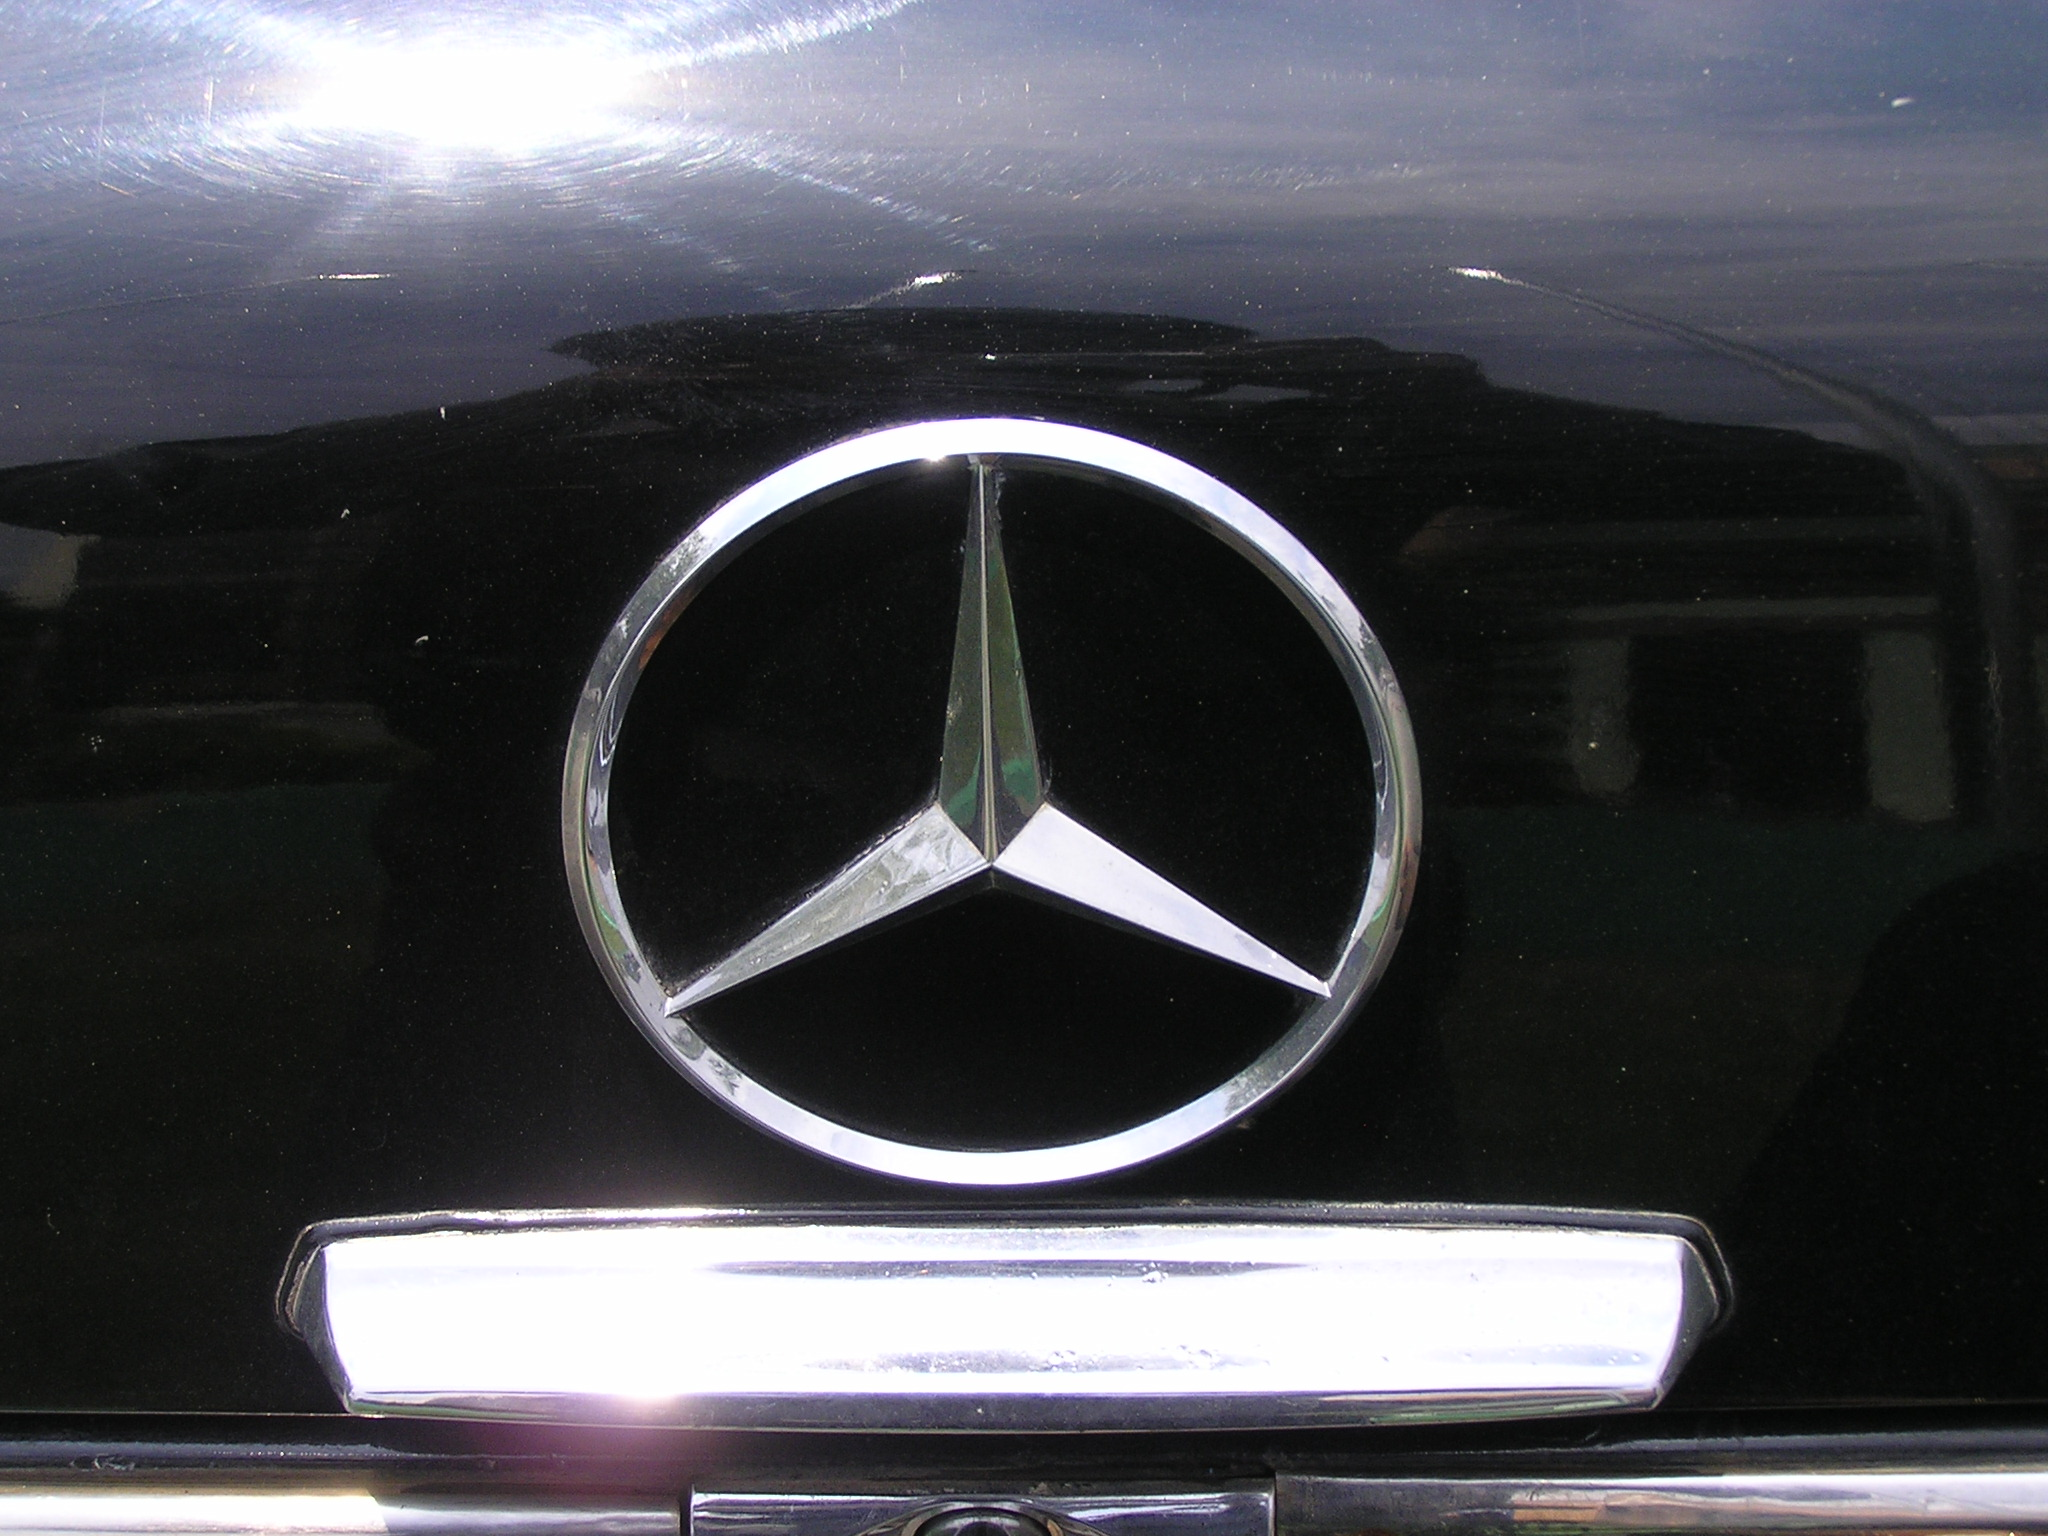 Trai-nghiem-qua-khu-ngot-ngao-tren-Mercedes-Benz-Limousine-230E-1969-anh-29